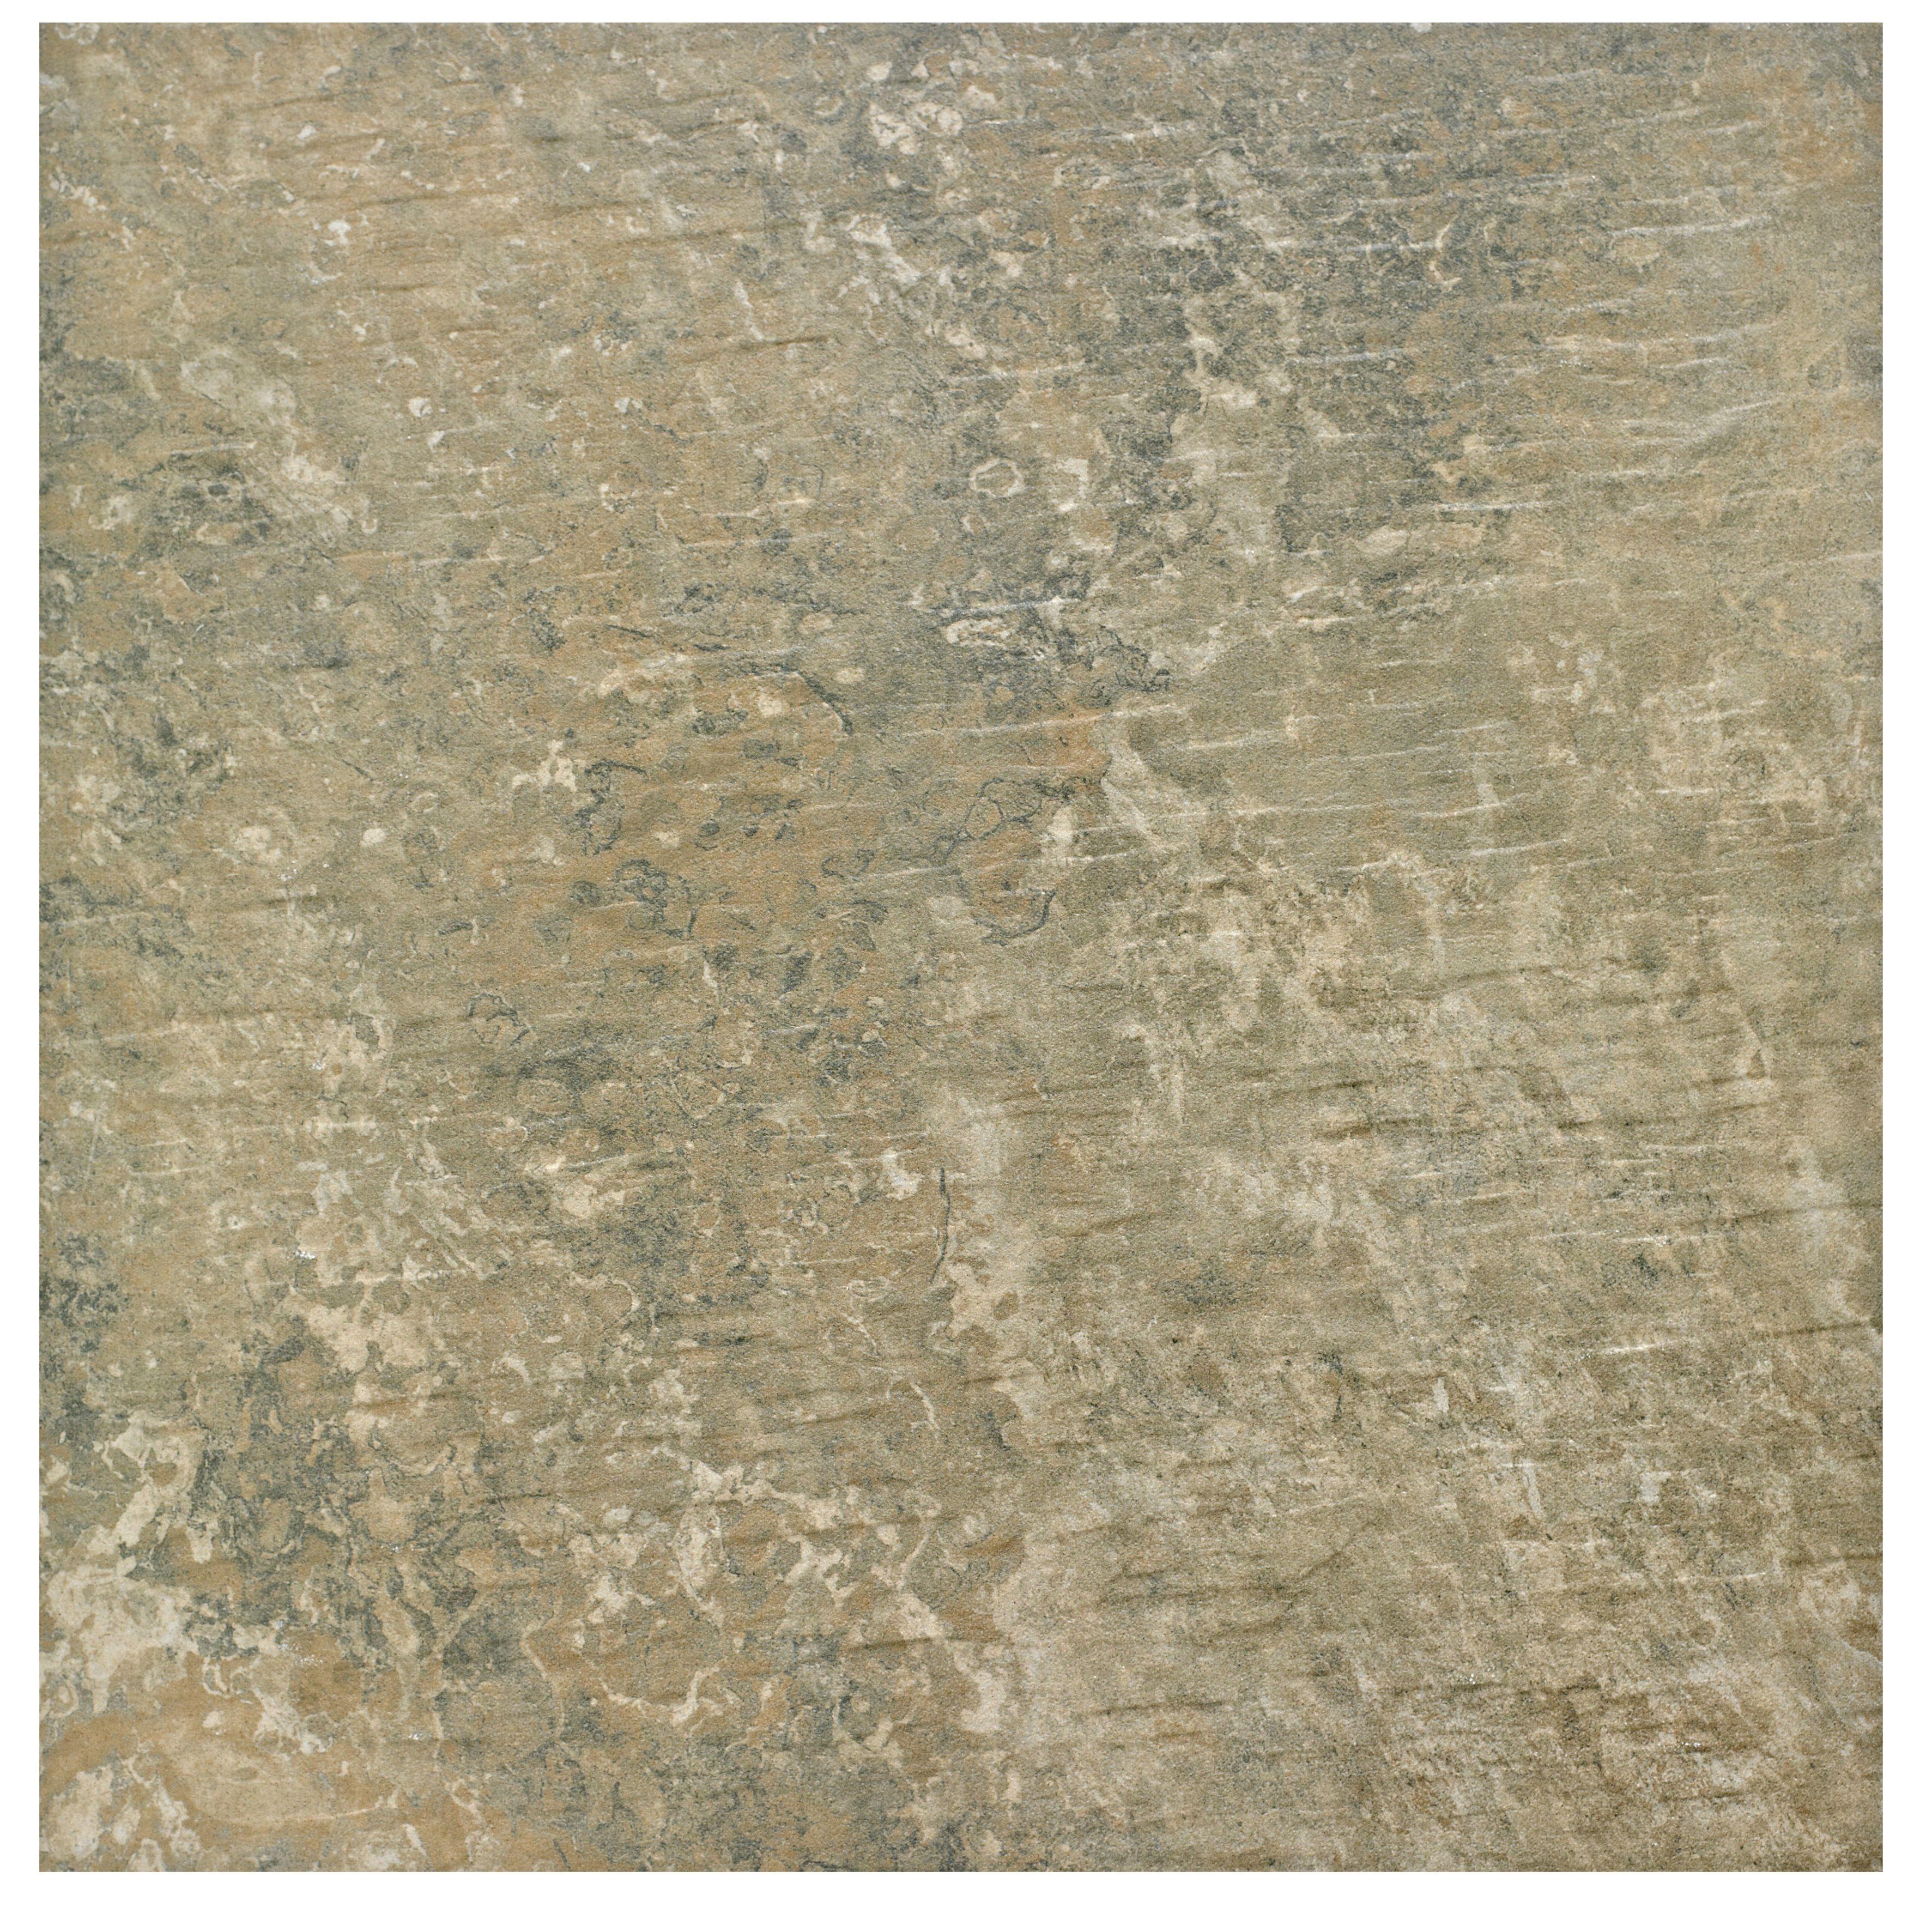 Brook Natural Stone Effect Porcelain Wall Floor Tile Pack Of 5 L 450mm W